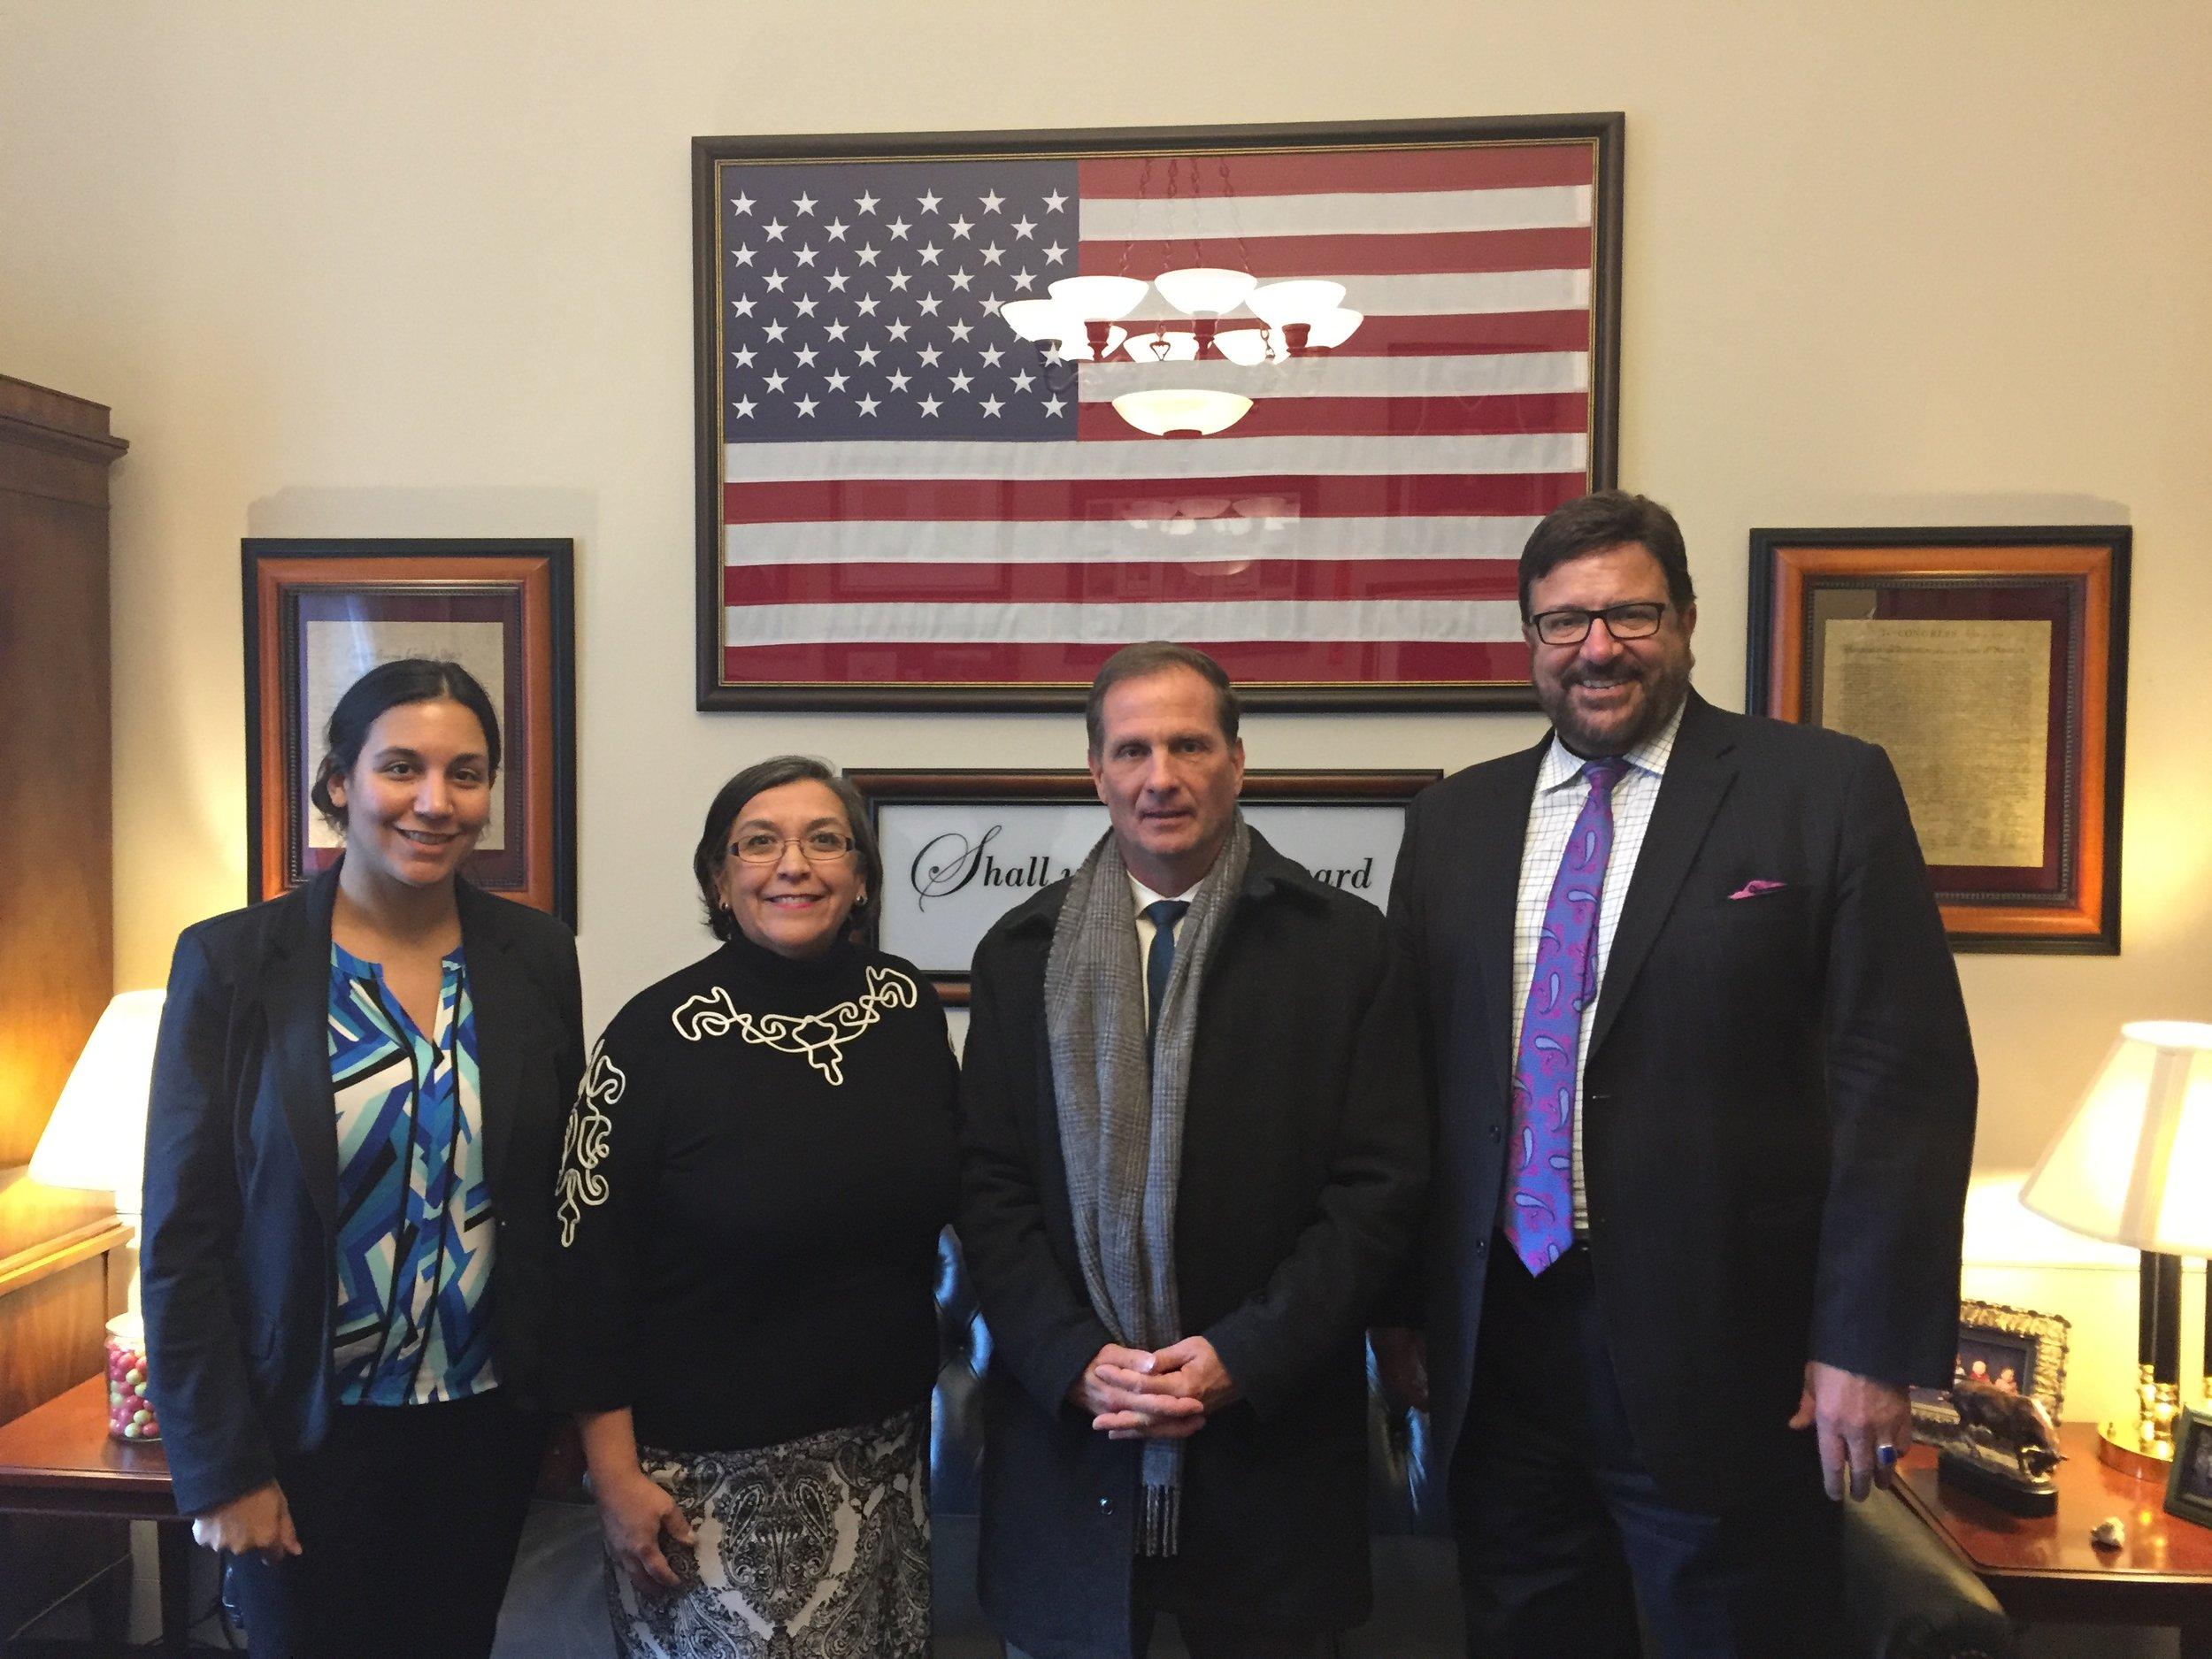 Camilla Simon, UT State Rep. Rebecca Chavez-Houck, U.S. Congressman Chris Stewart, and UT State Rep. Mark Archuleta Wheatley